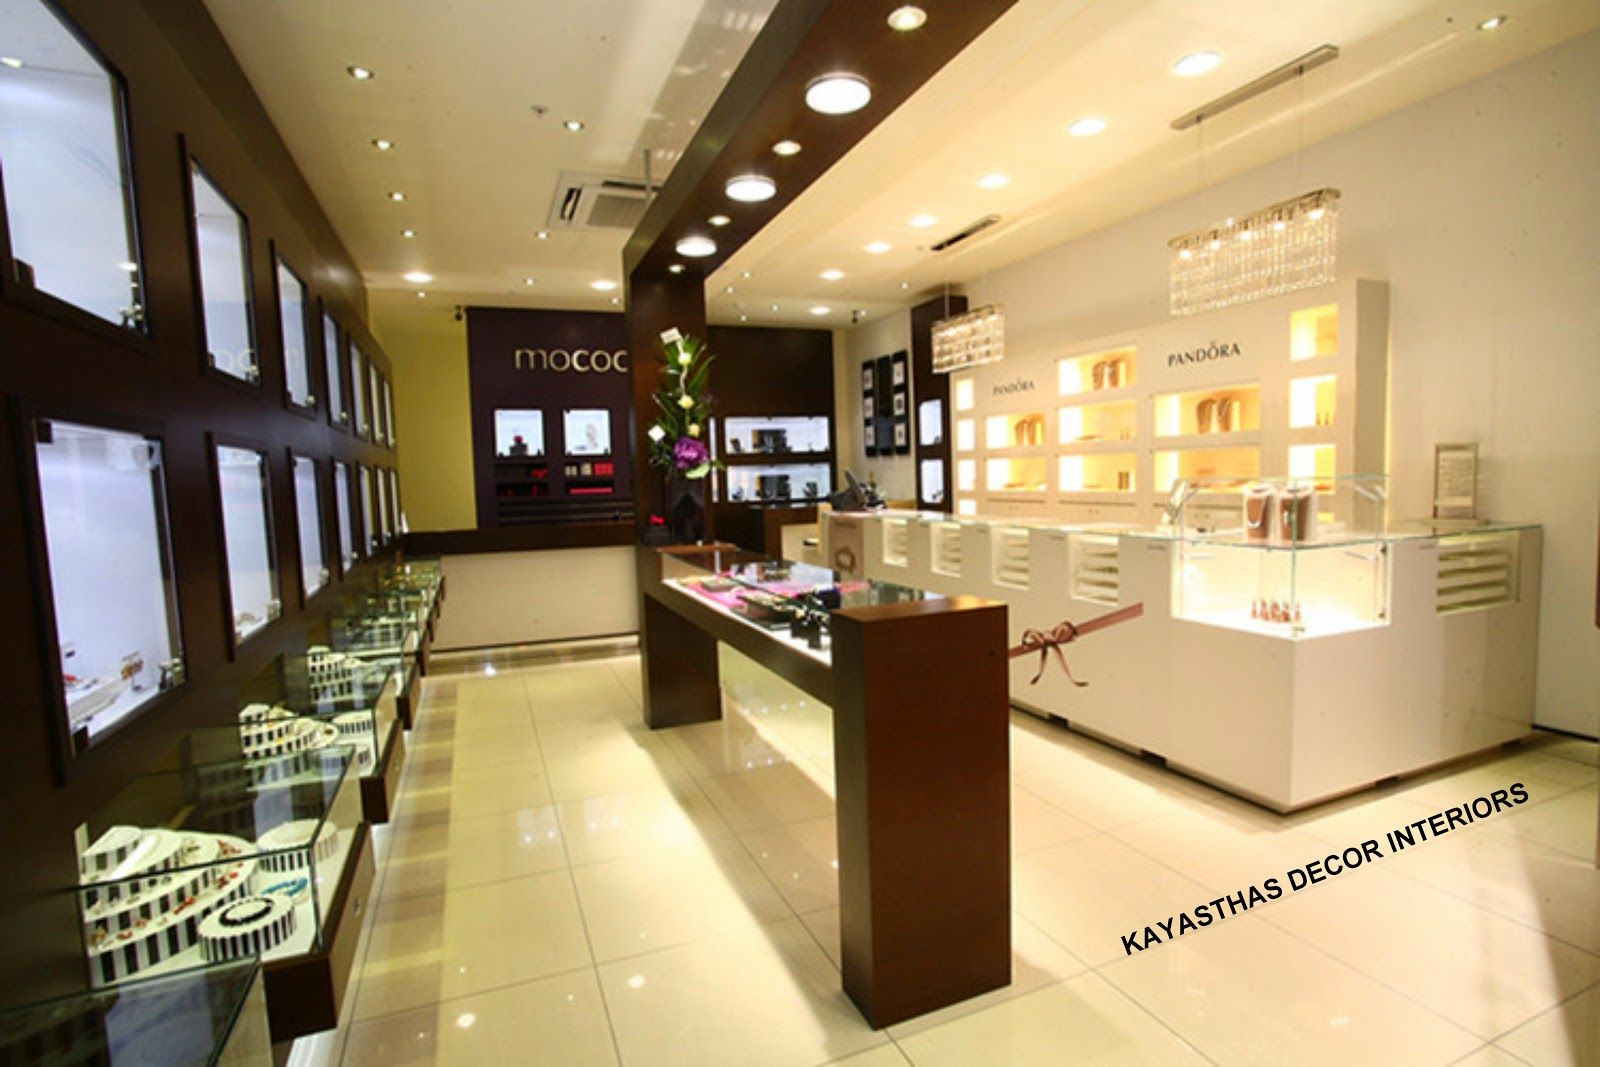 Kayasthas decor interiors jewellery showrooms interiors